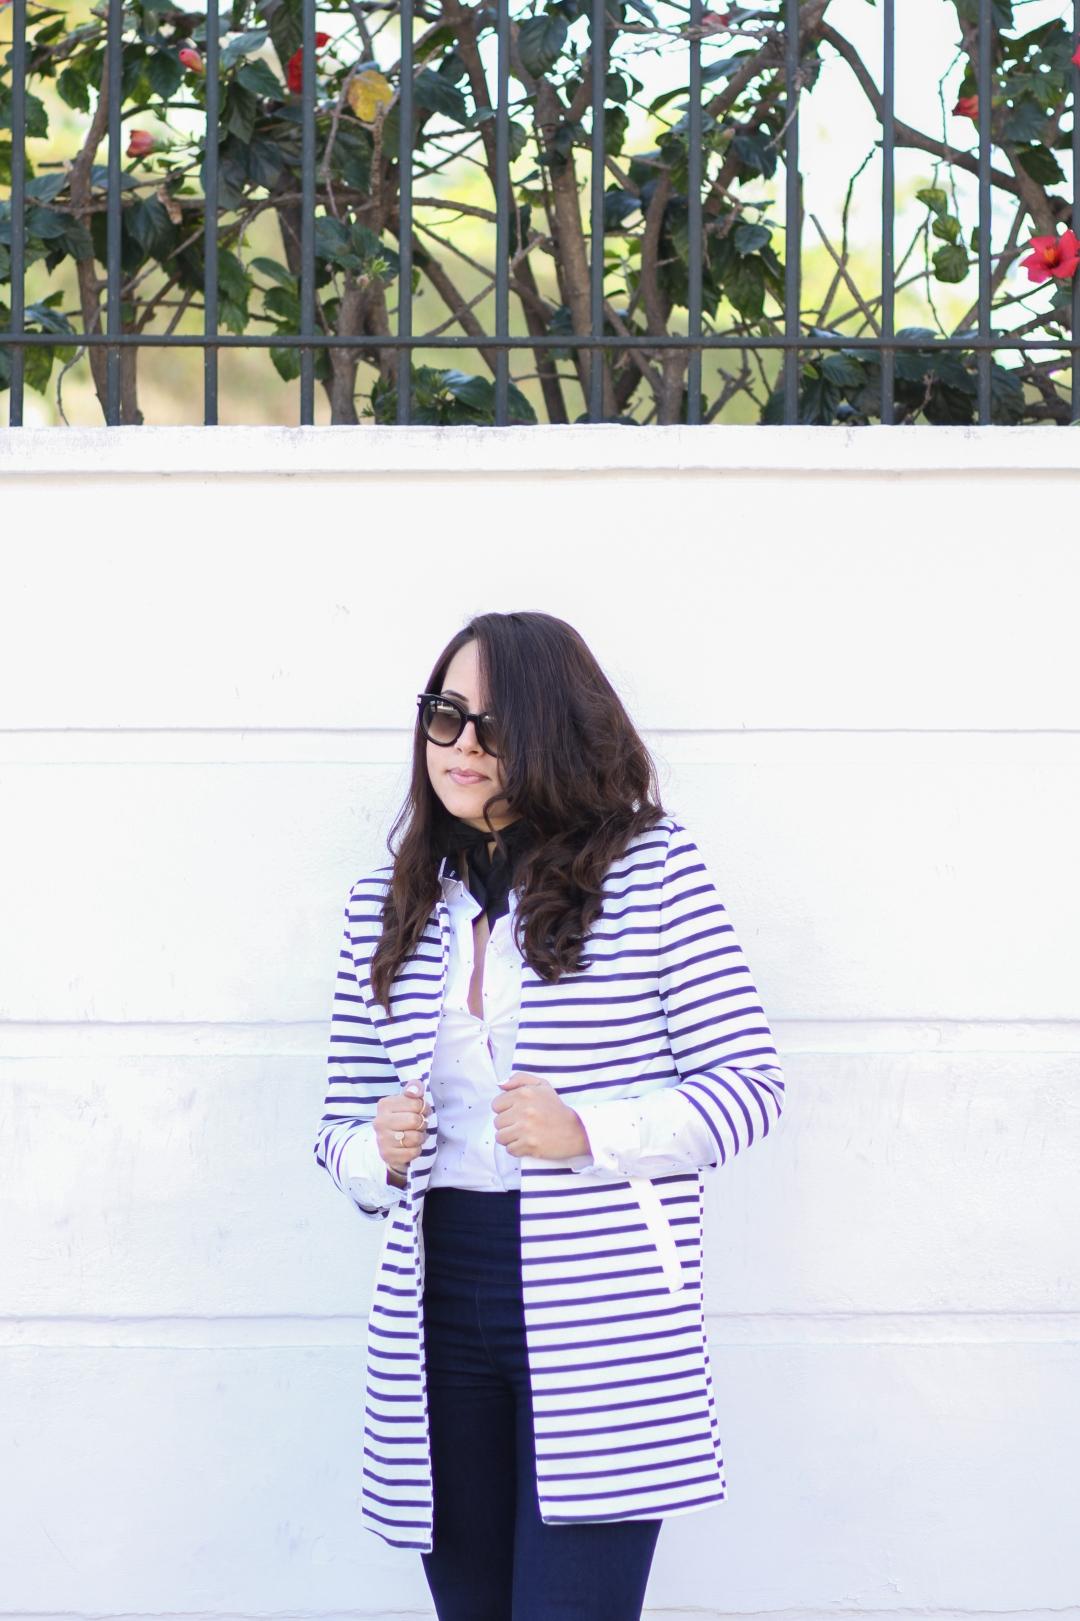 La-veste-rayée-blog-mode-chiccarpediem-9